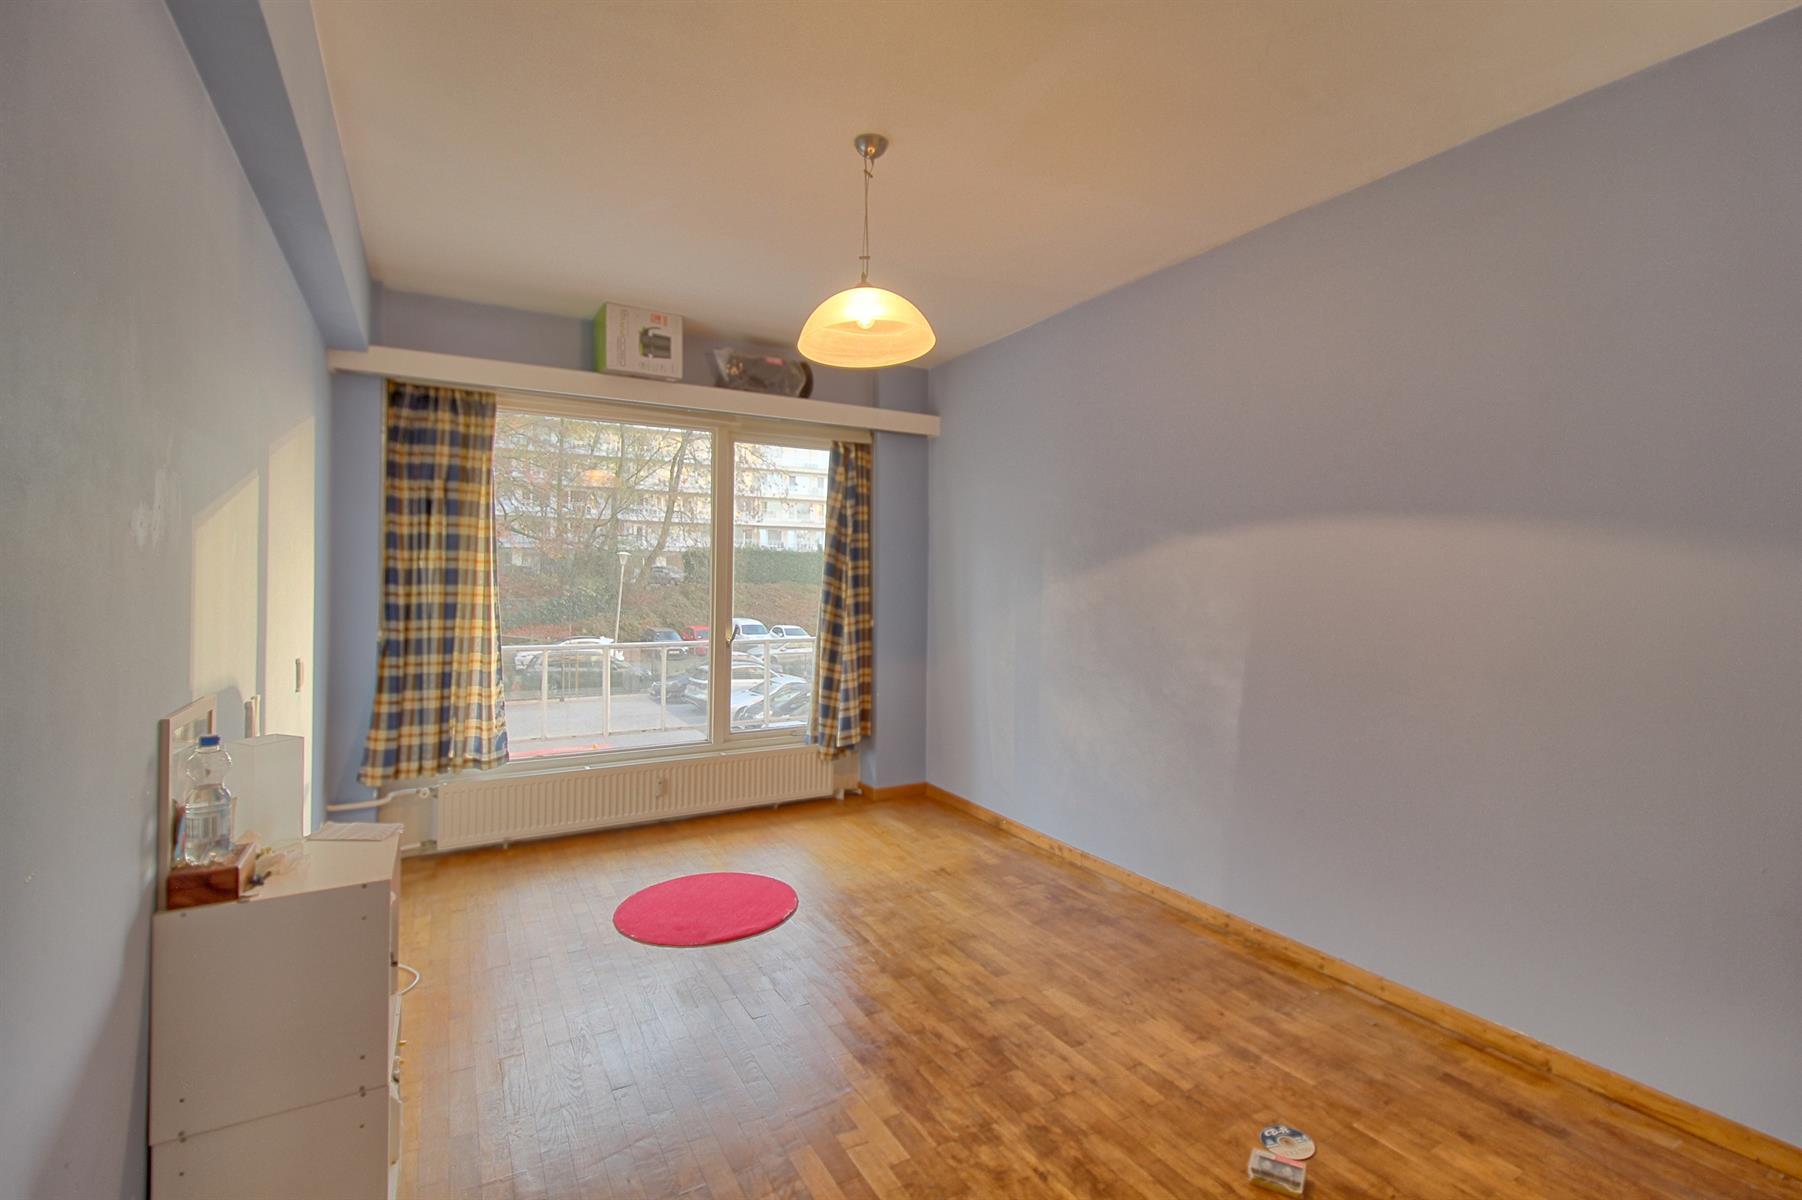 Appartement - Woluwe-Saint-Lambert - #4213719-3